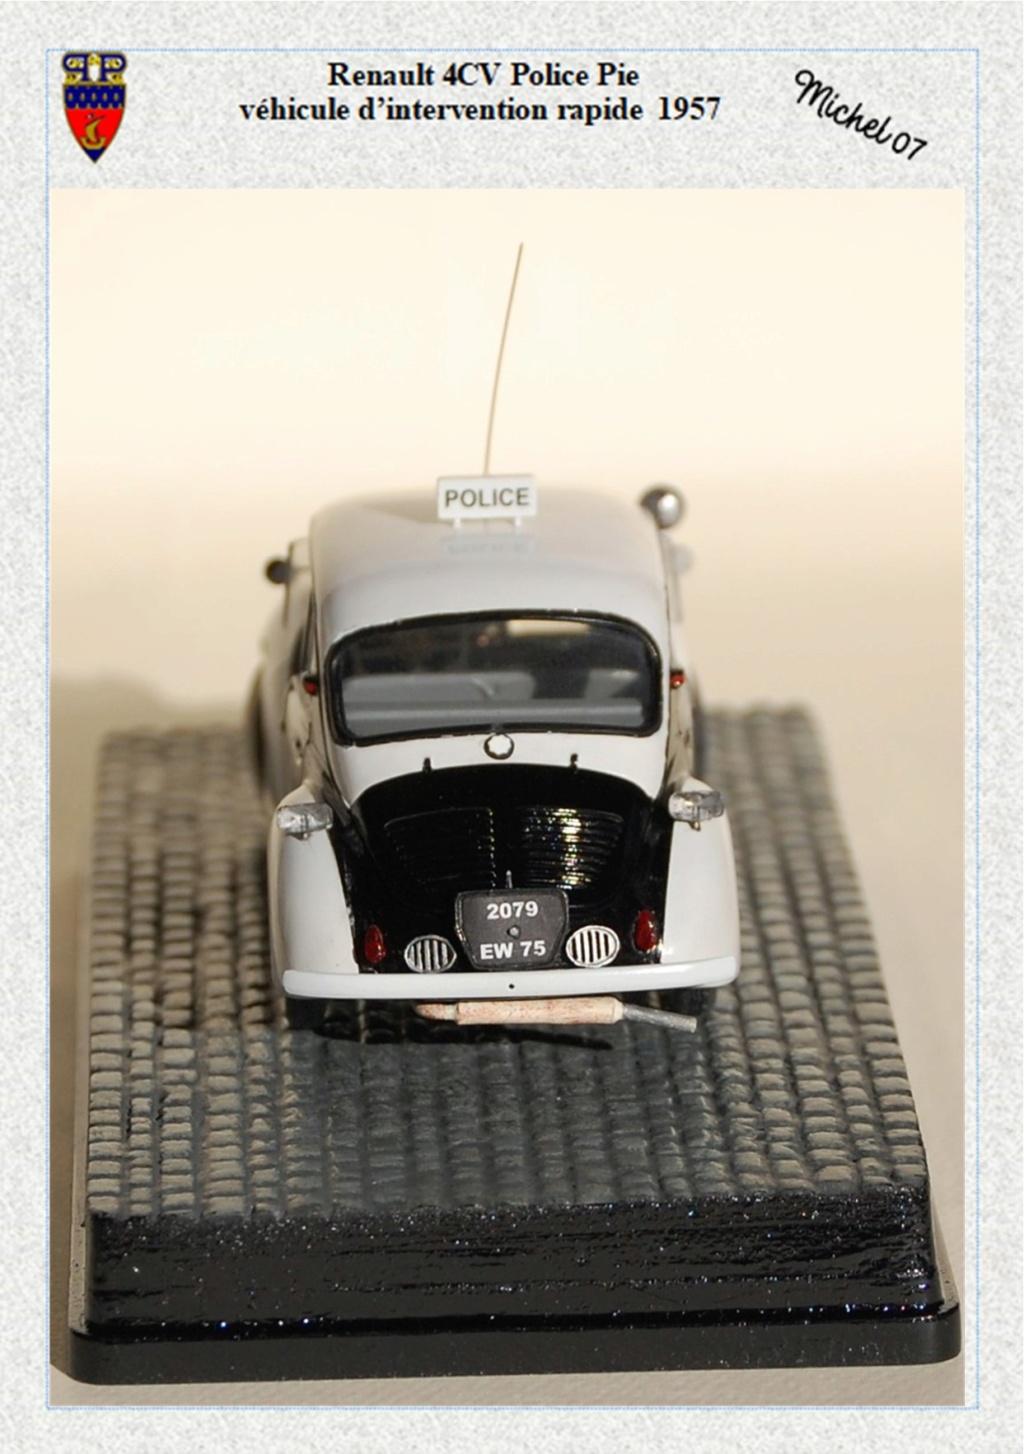 renault 4 cv pie 1957 Heller 1/24 (Terminé) Image615